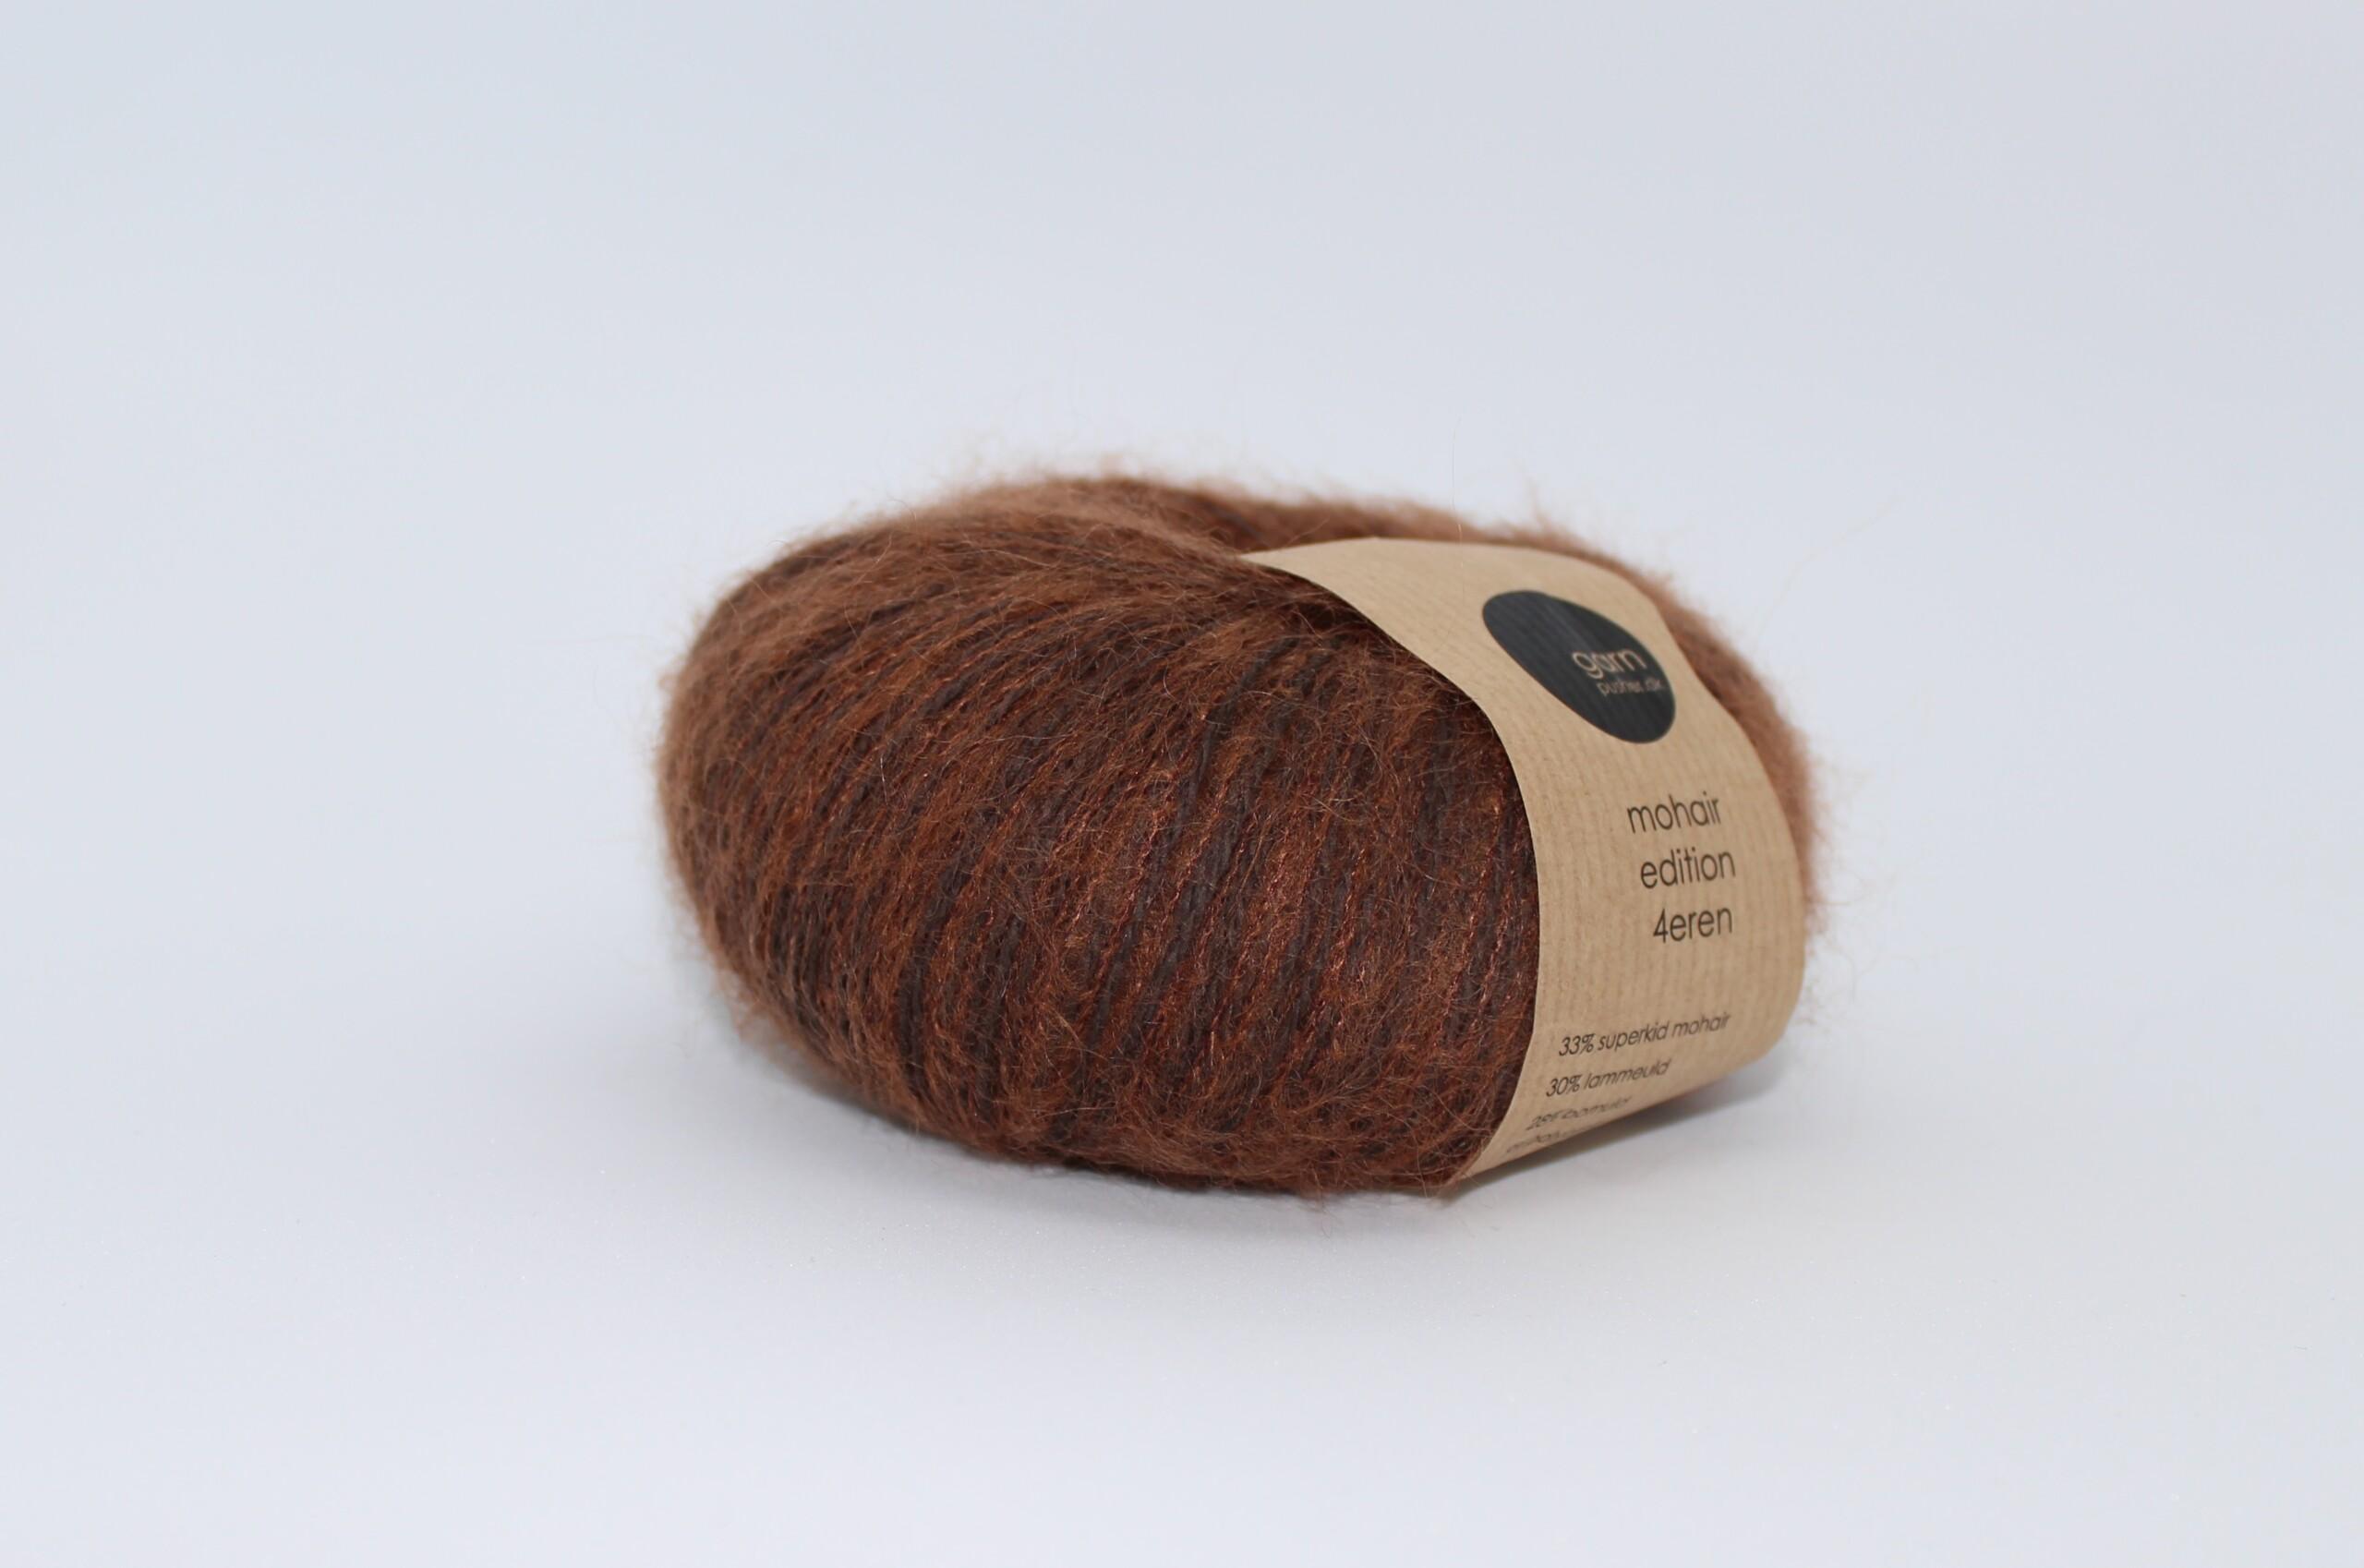 Mohair edition 4eren garn dark caramel gylden brun